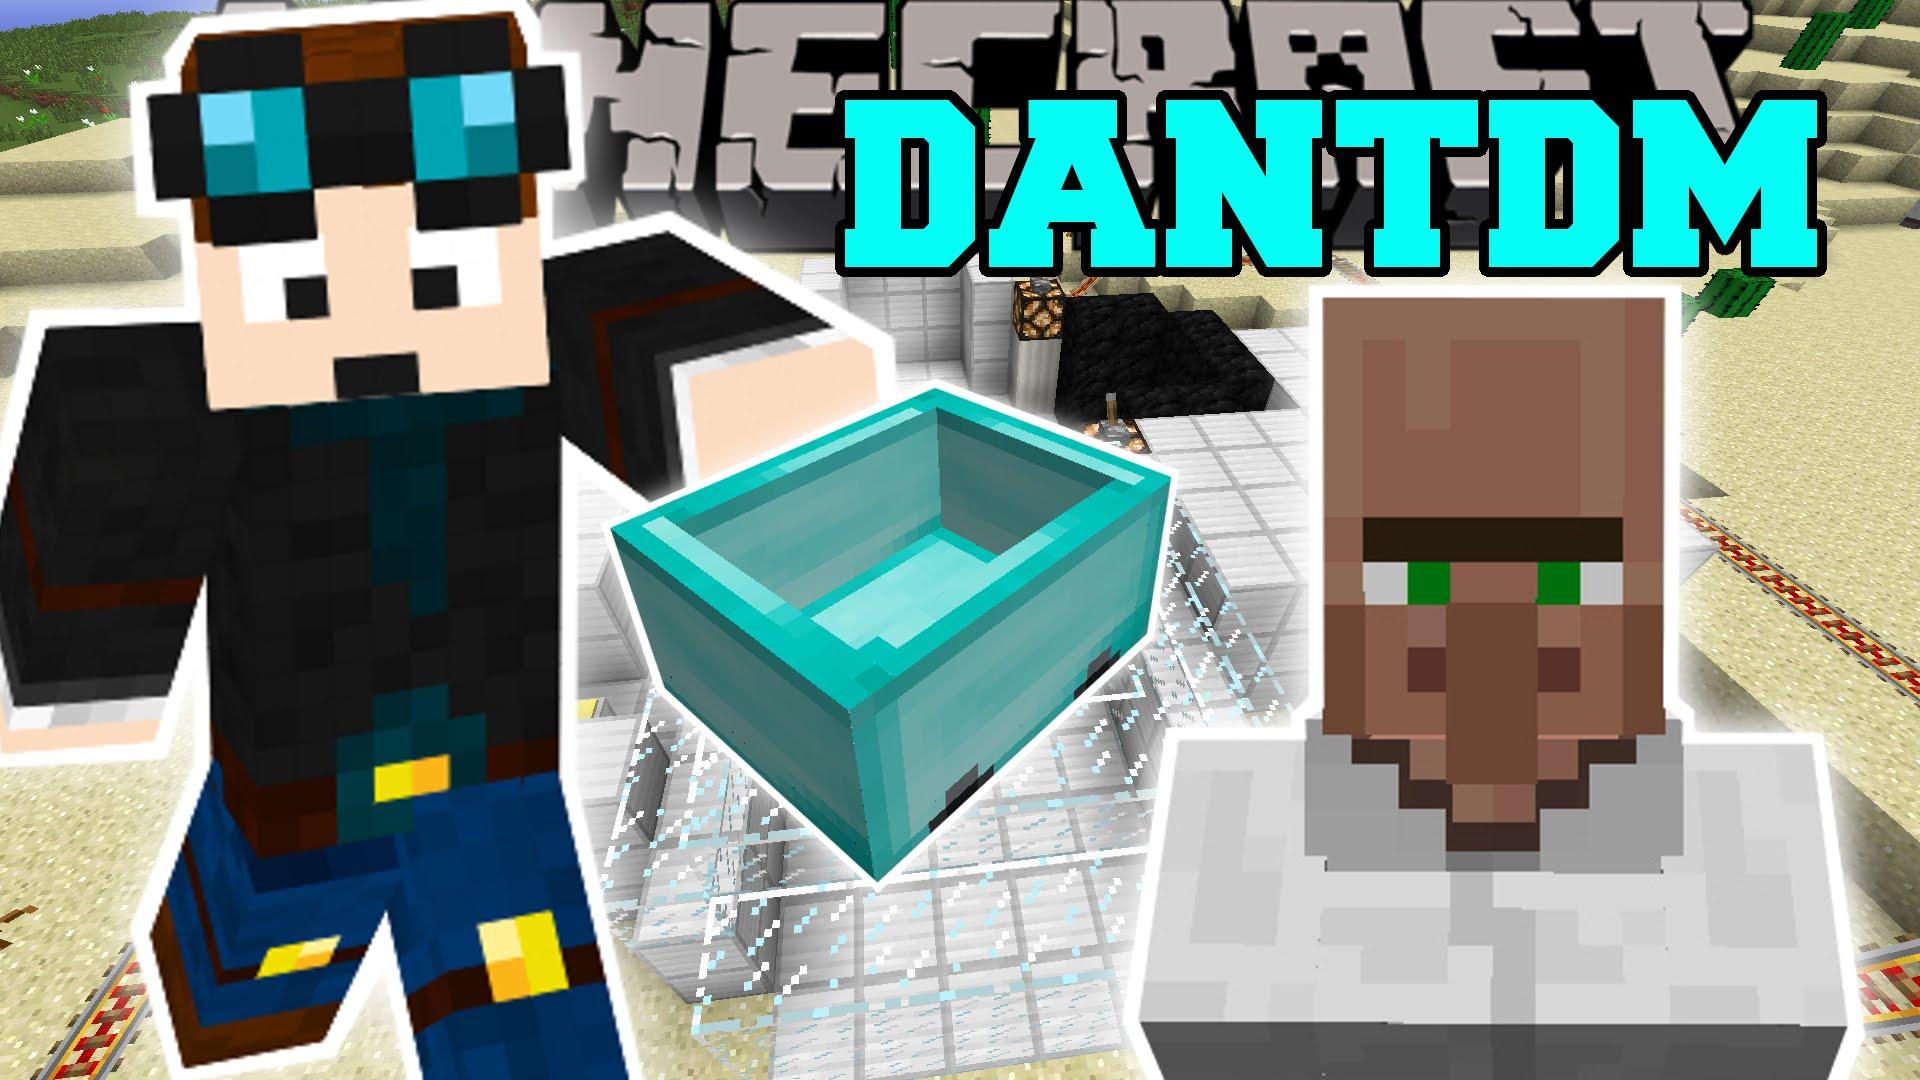 Minecraft THEDIAMONDMINECART MOD TRAYAURUS THE LAB DANTDM Mod 1920x1080